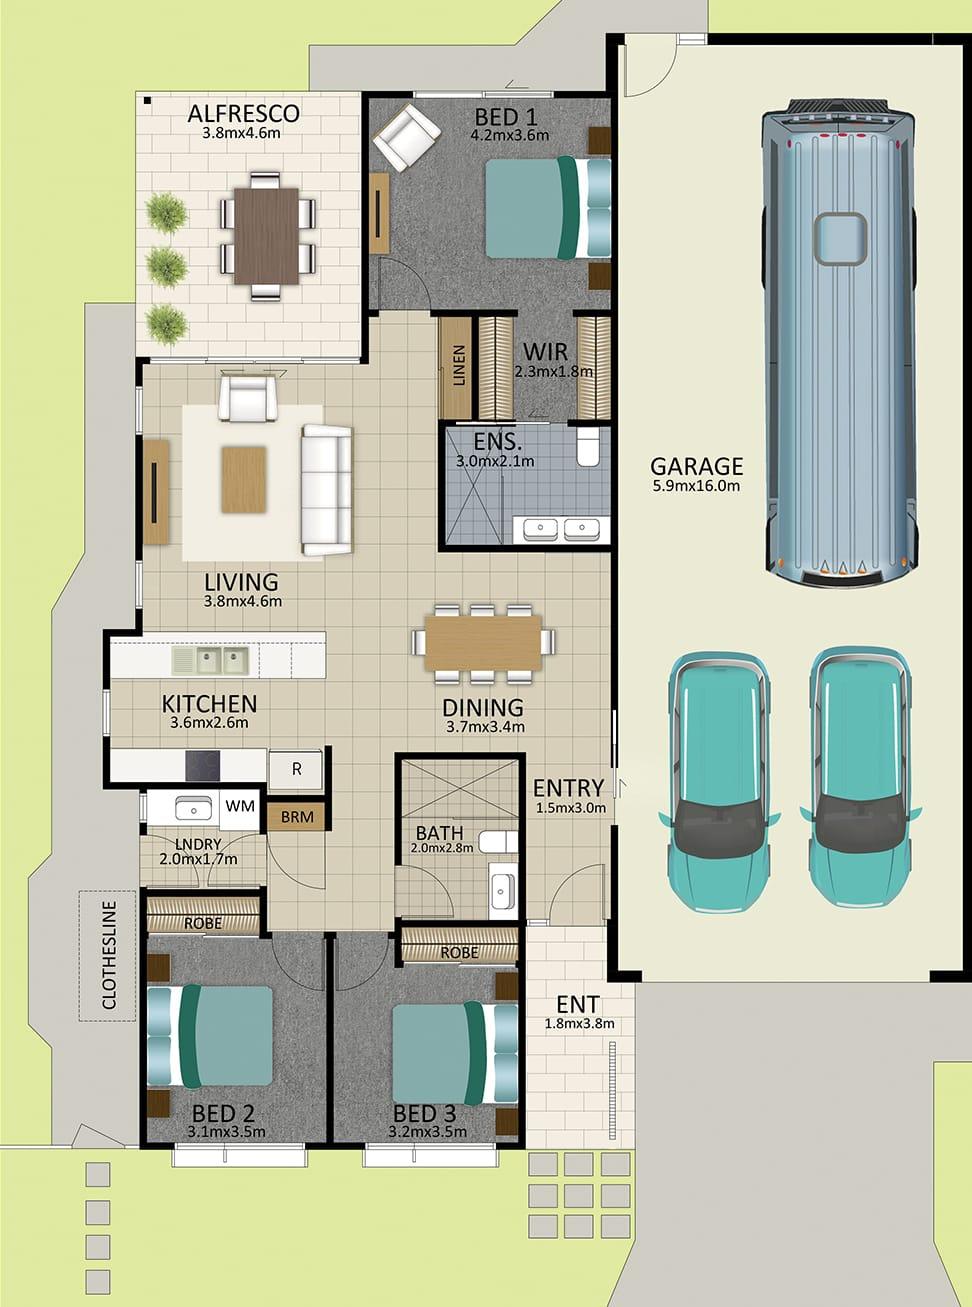 LR WEB LAT25 Floorplan LOT 160 Watson JUL19 V1 - Lot 160